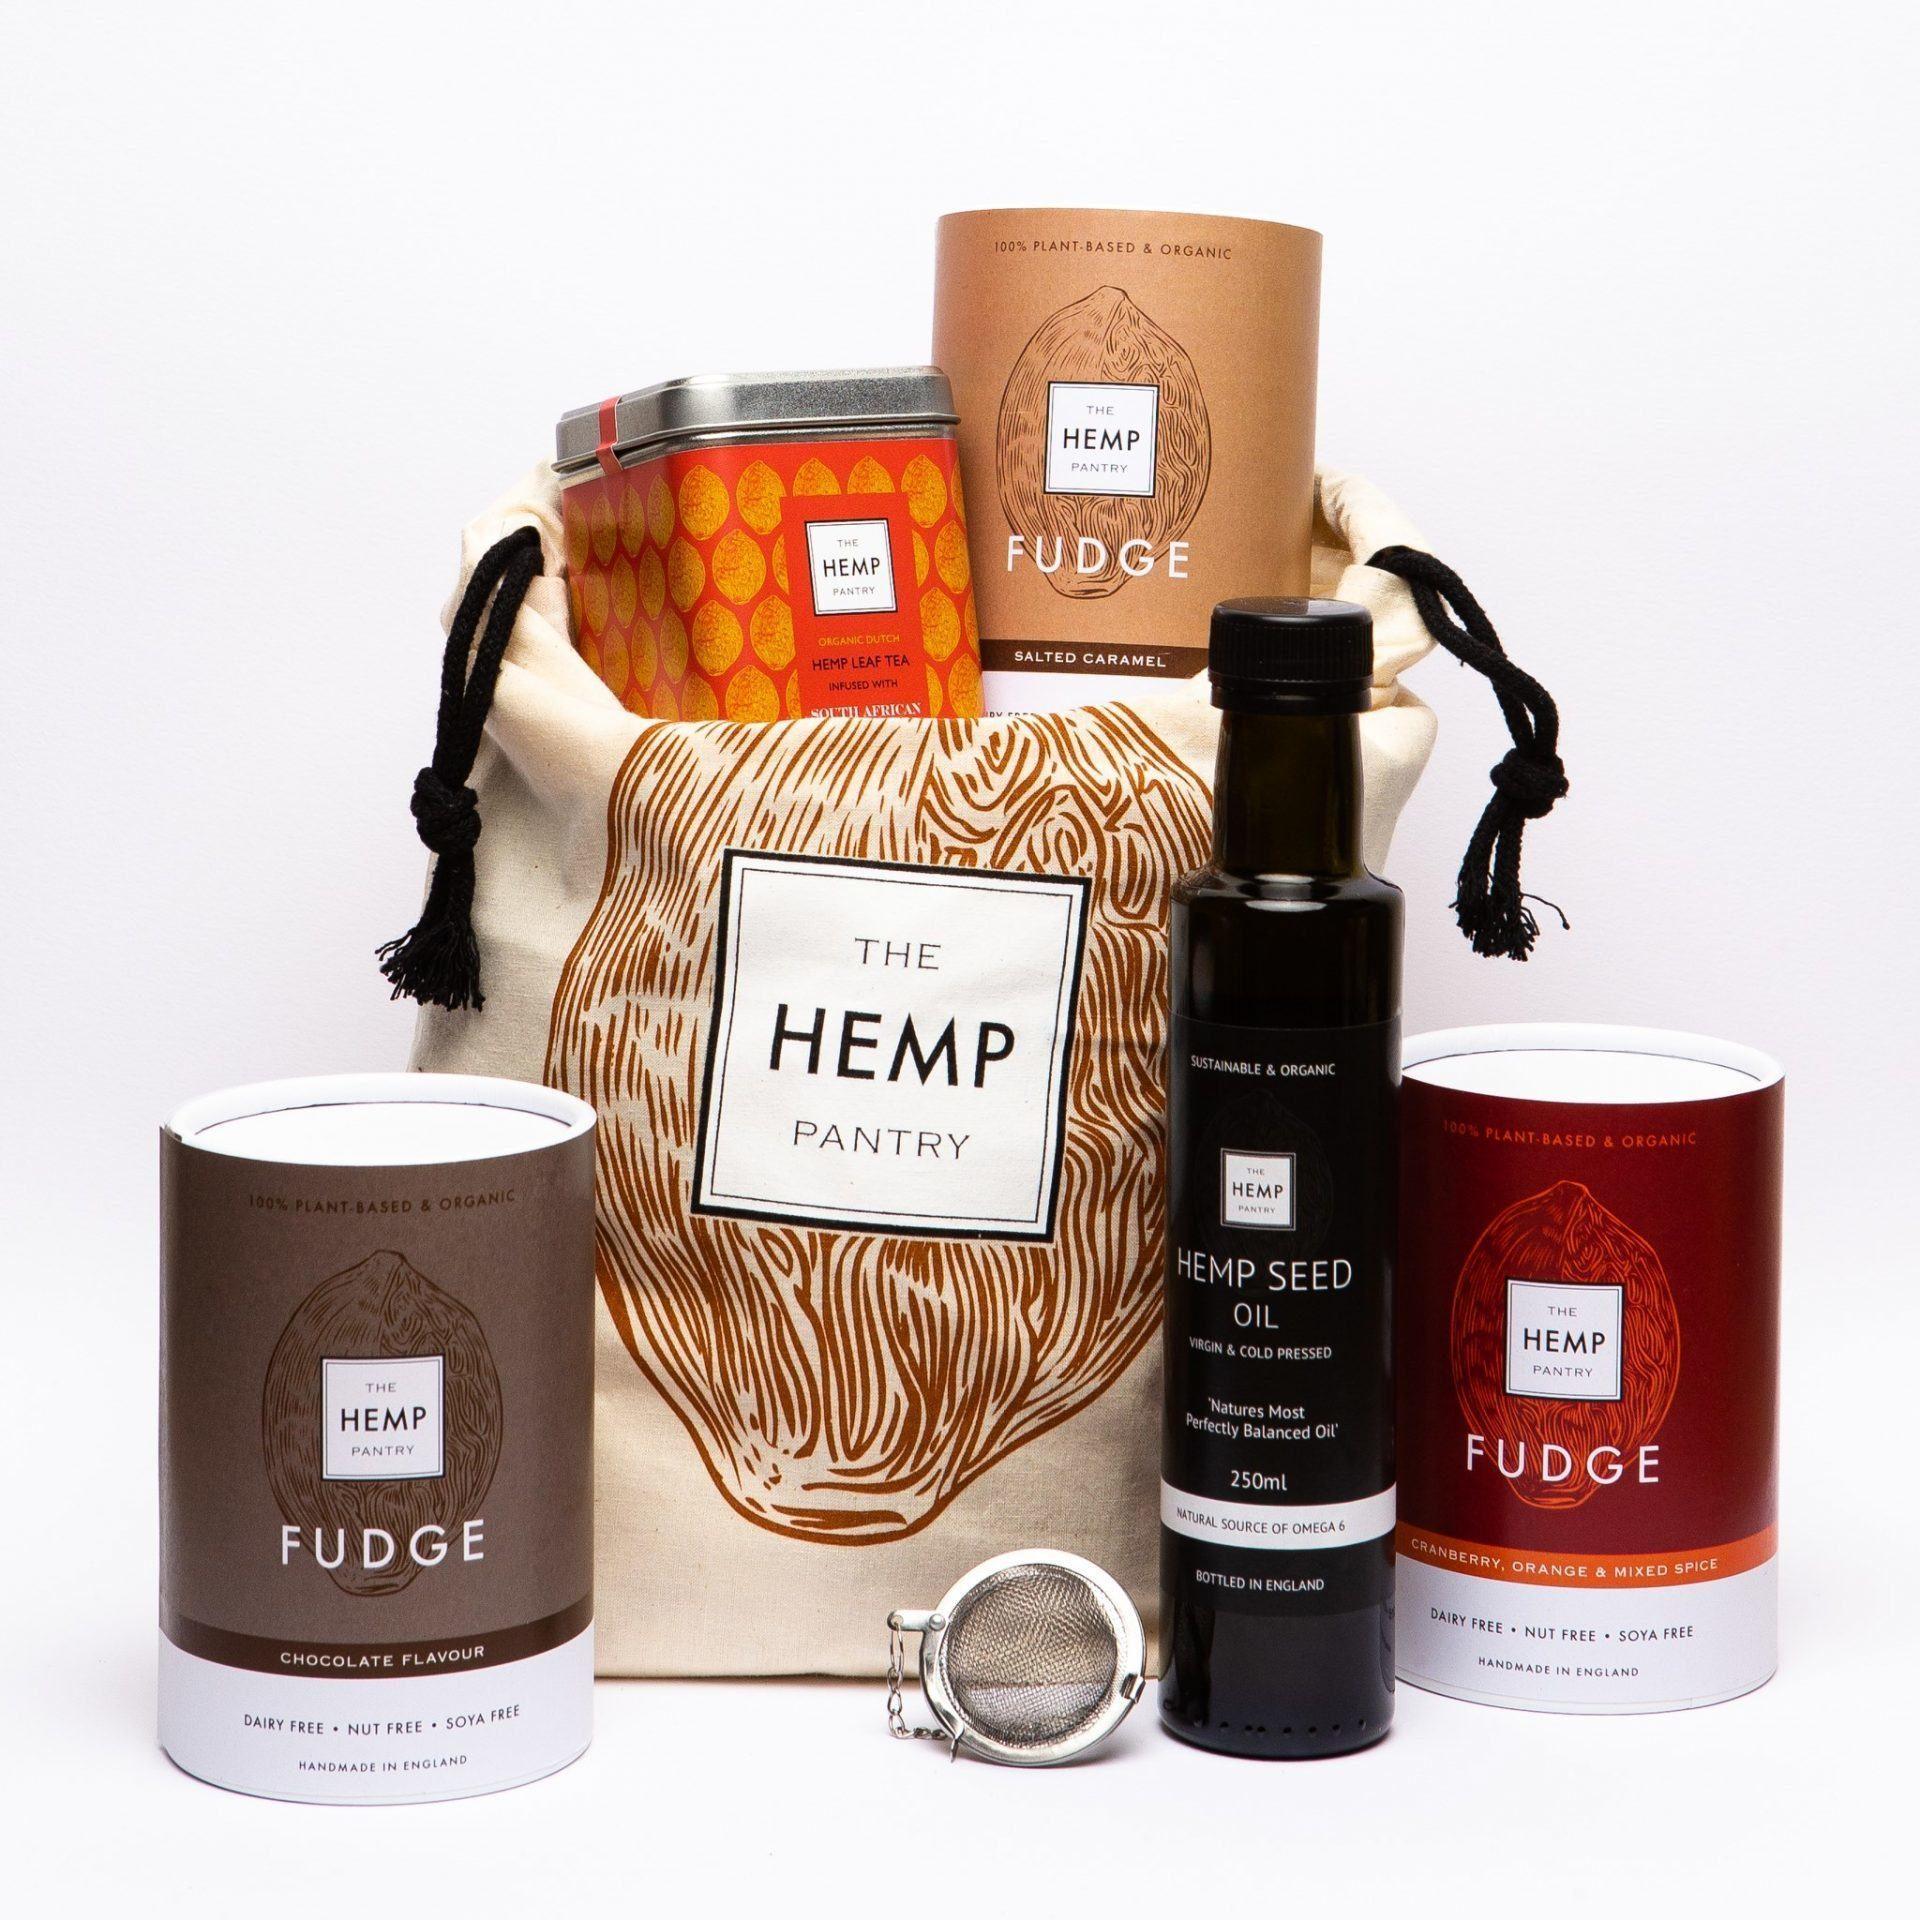 TheHempPantry-Hemp Pantry Gift Bag 2